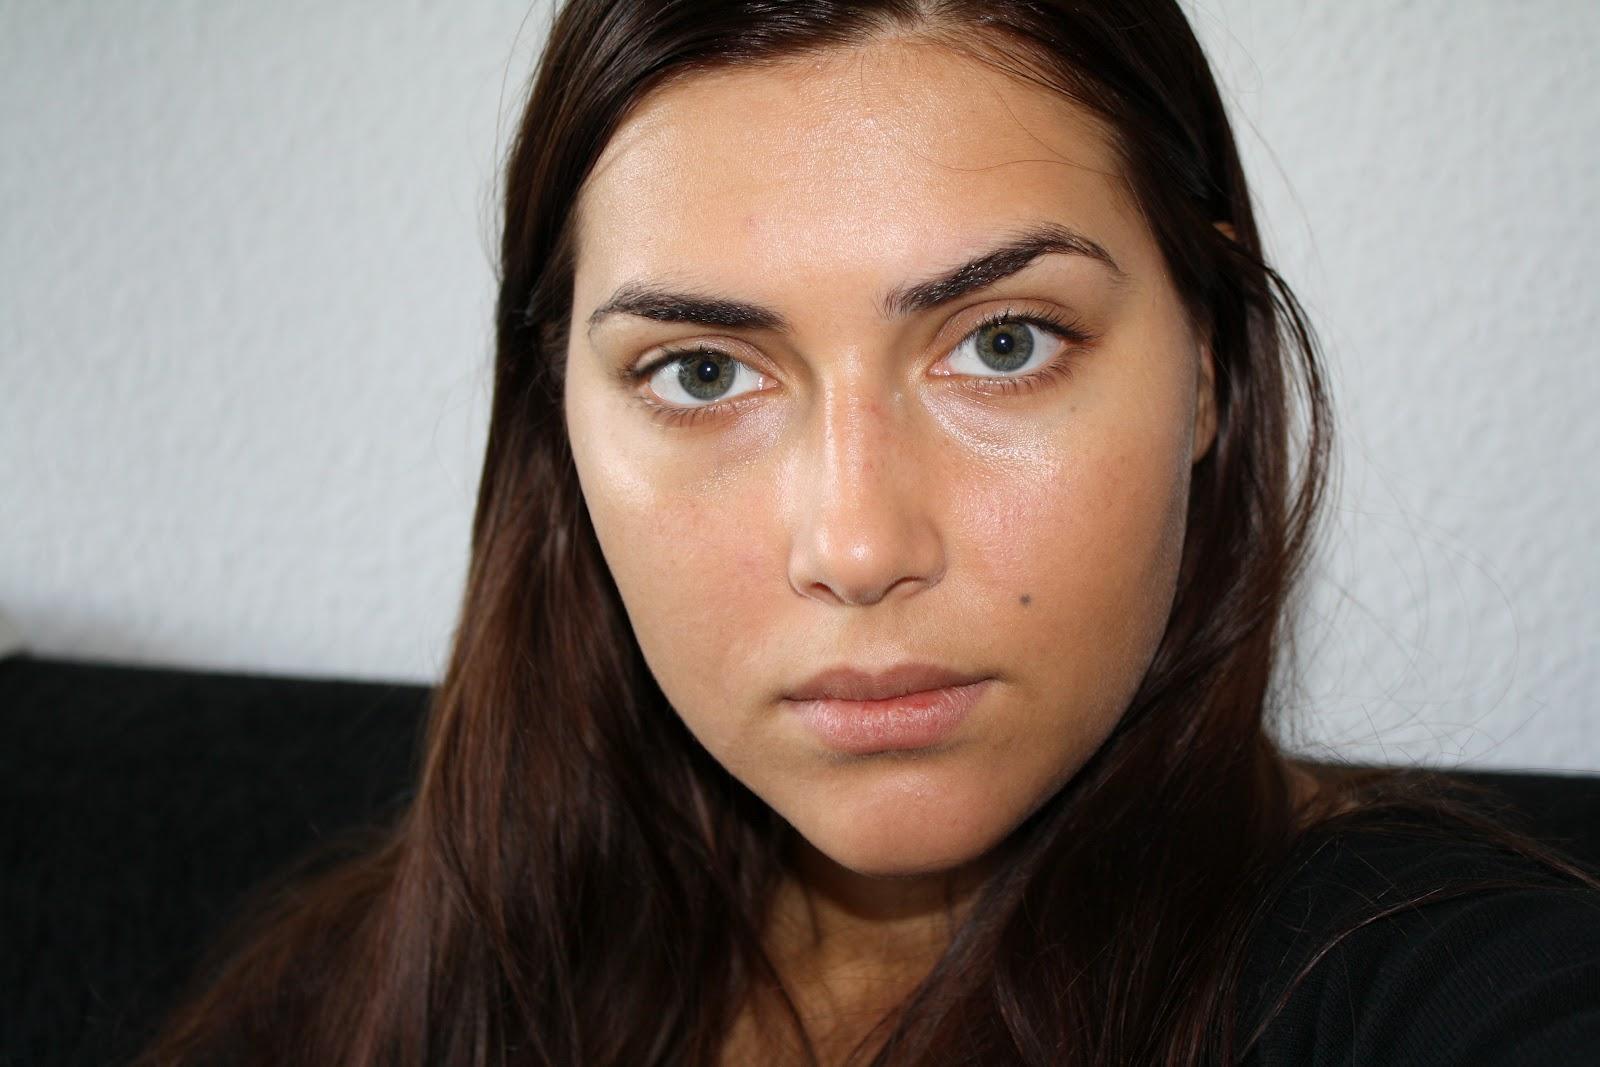 Dior hydra life pro youth skin tint